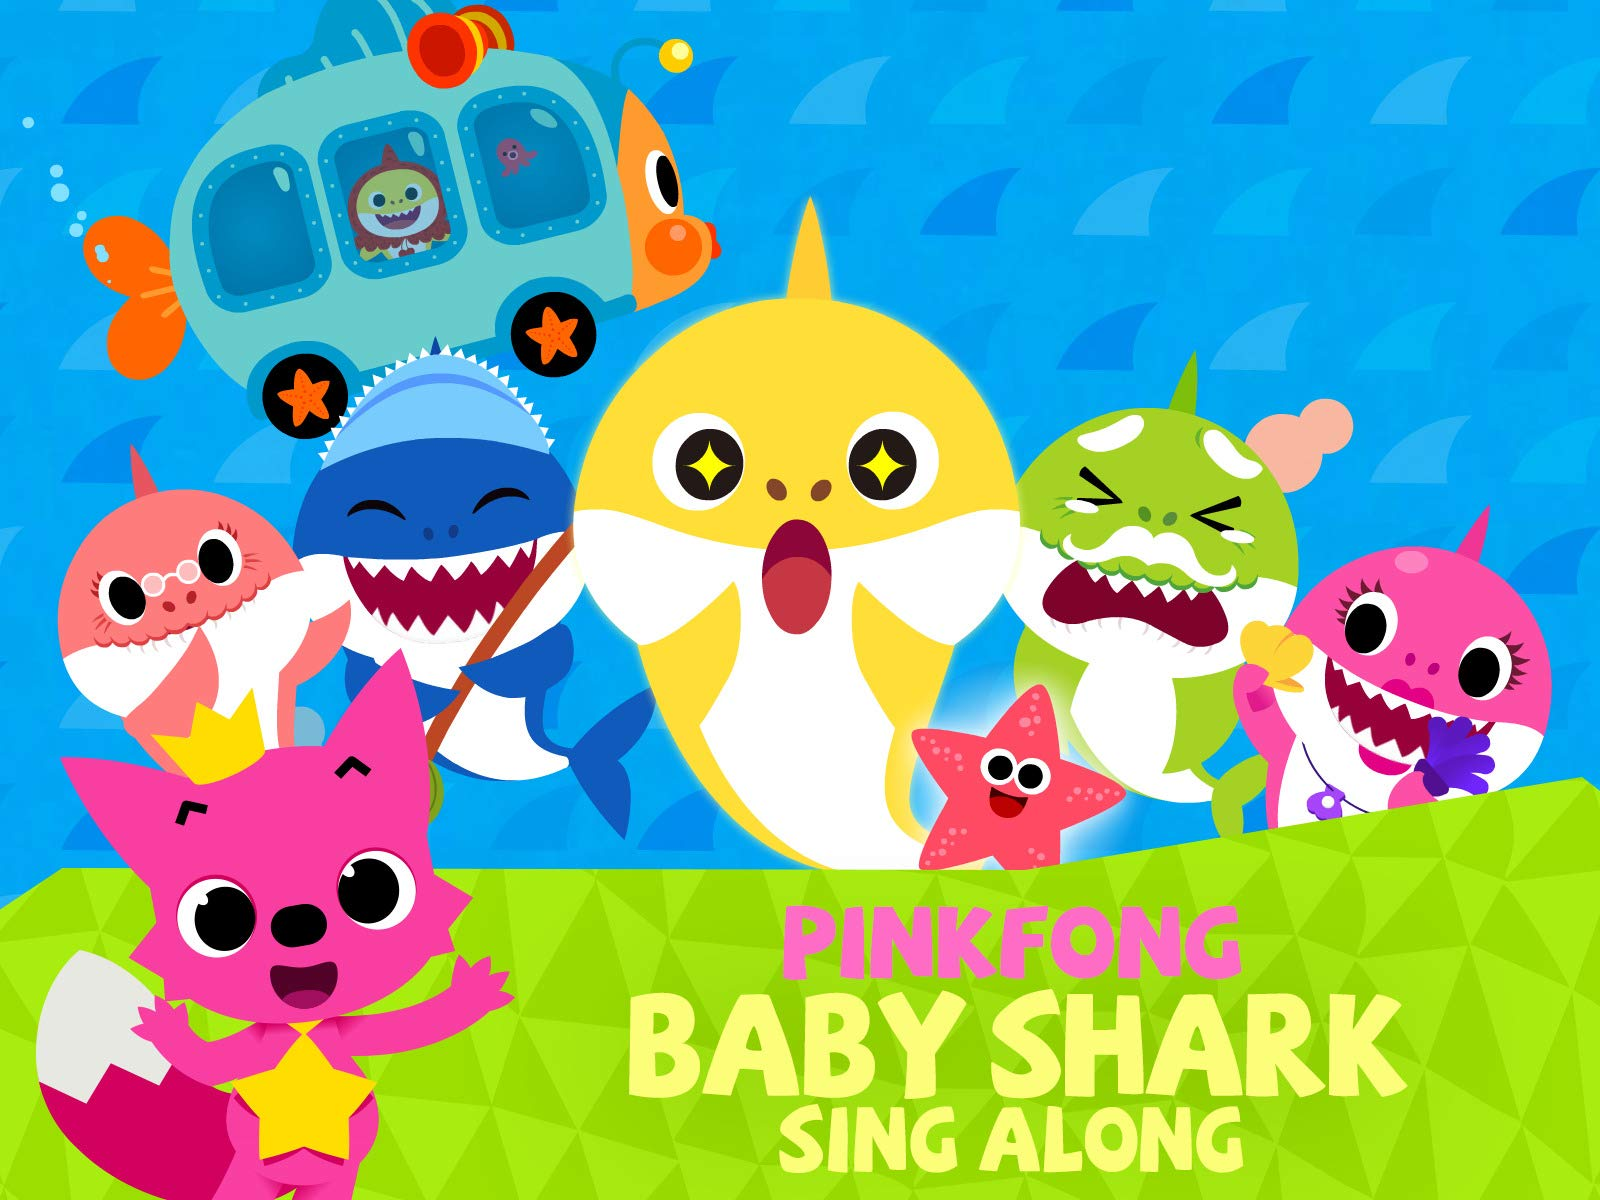 amazoncom watch pinkfong baby shark sing along prime video